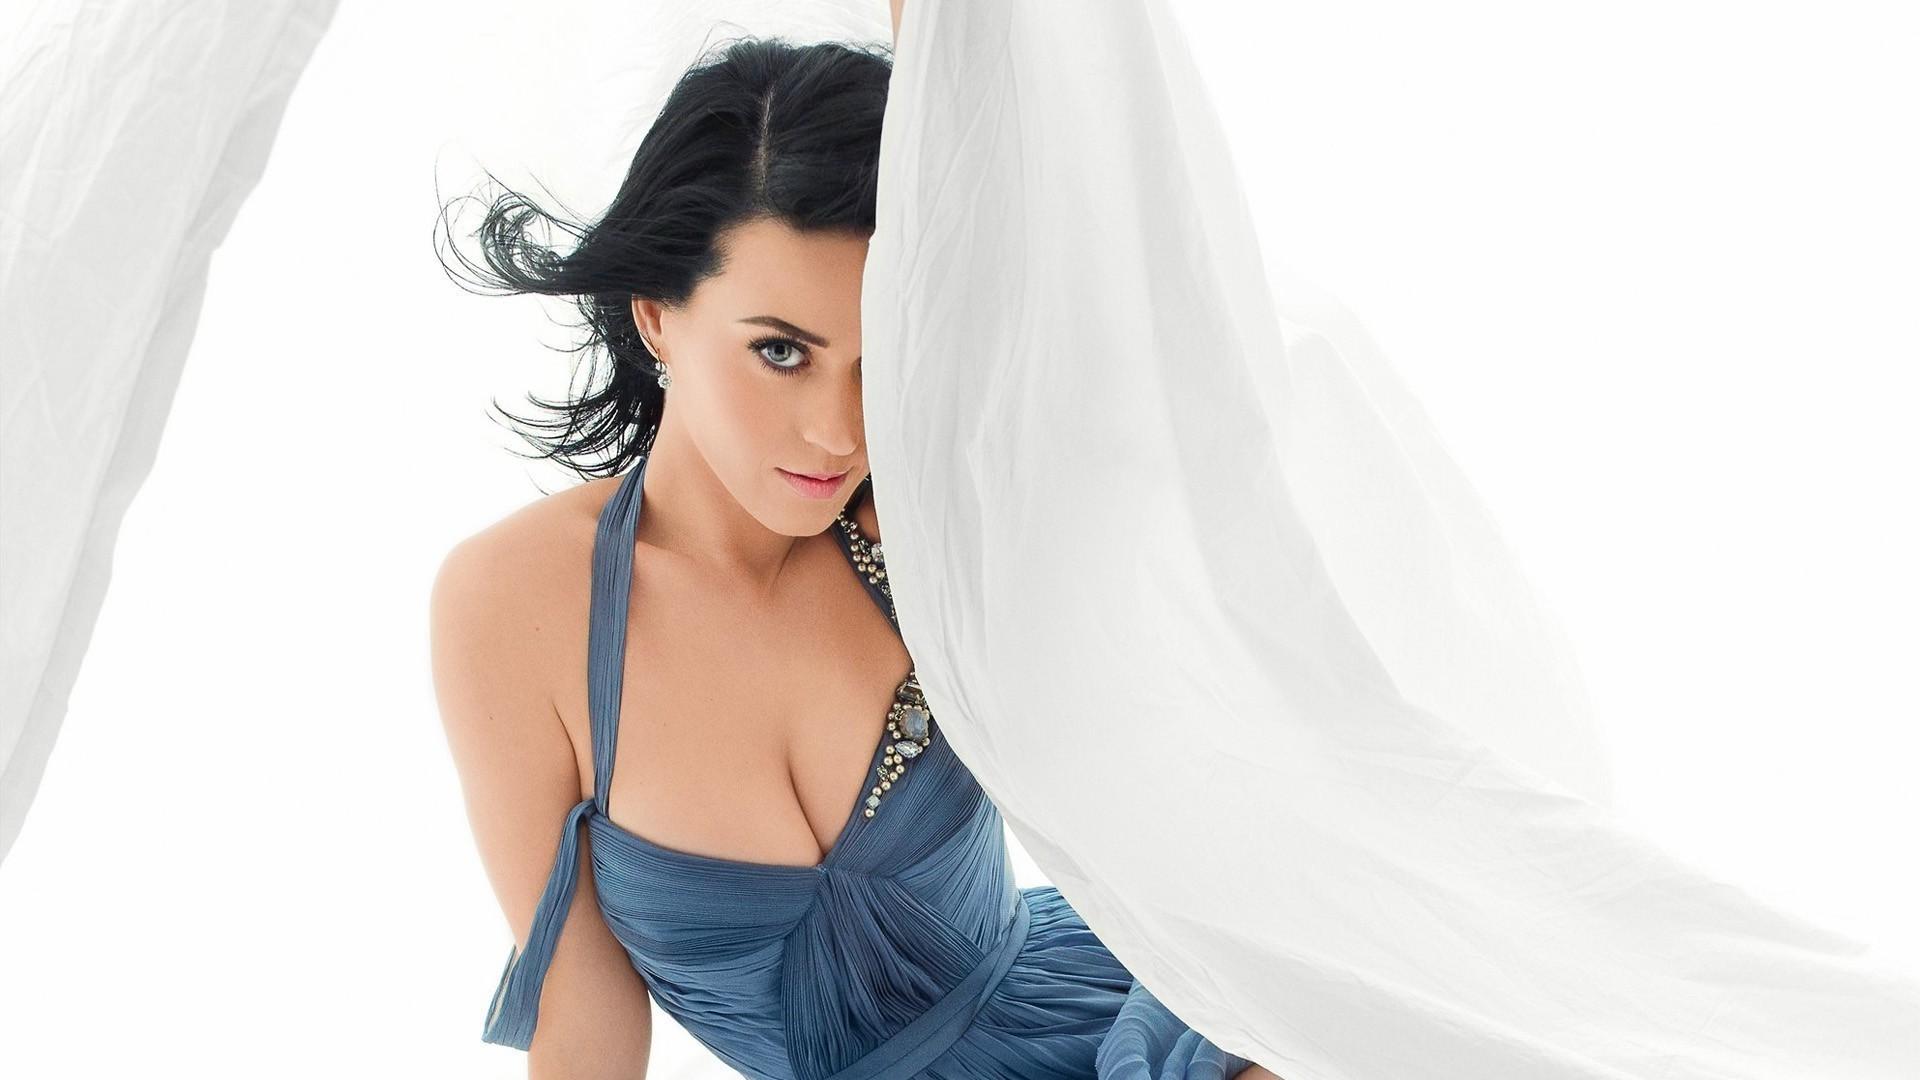 Katy Perry Wallpaper HD